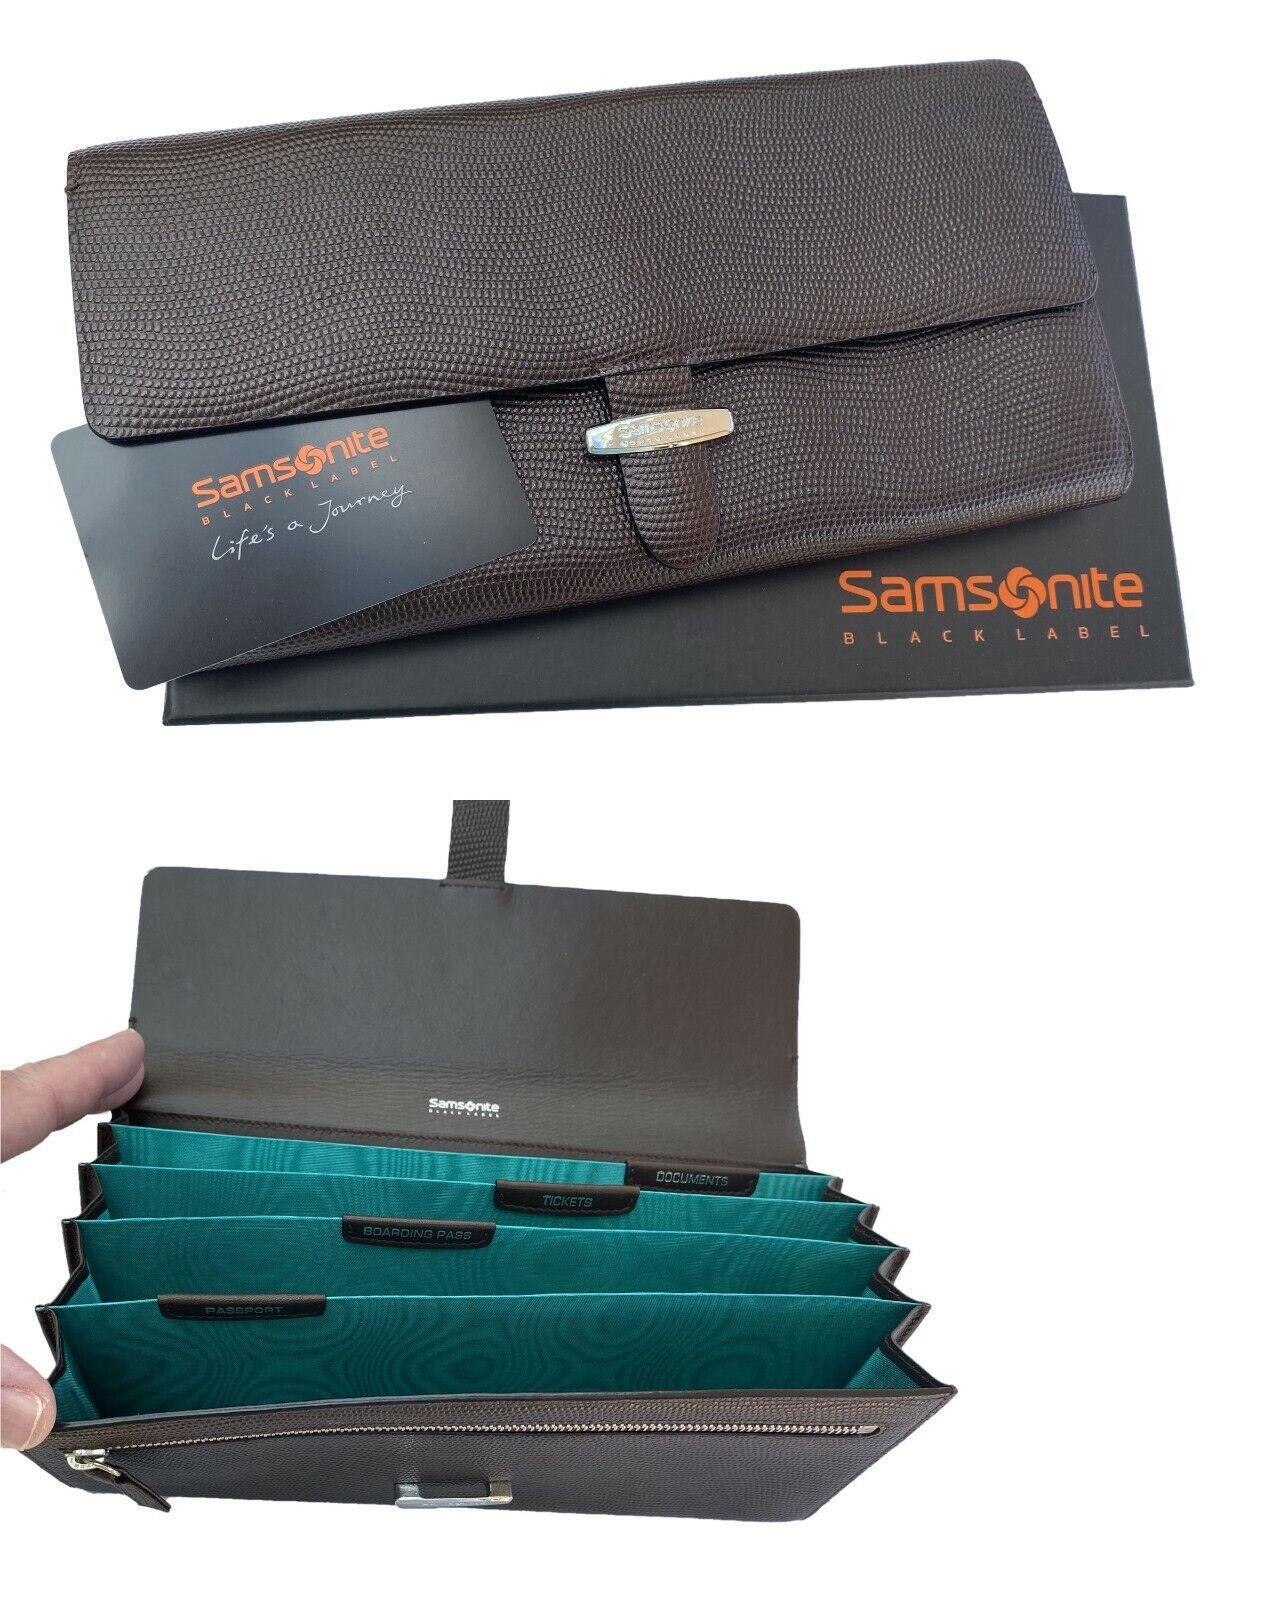 New SAMSONITE BLACK LABEL SBL STATIONERY Leather TRAVEL WALLET Organiser Brown